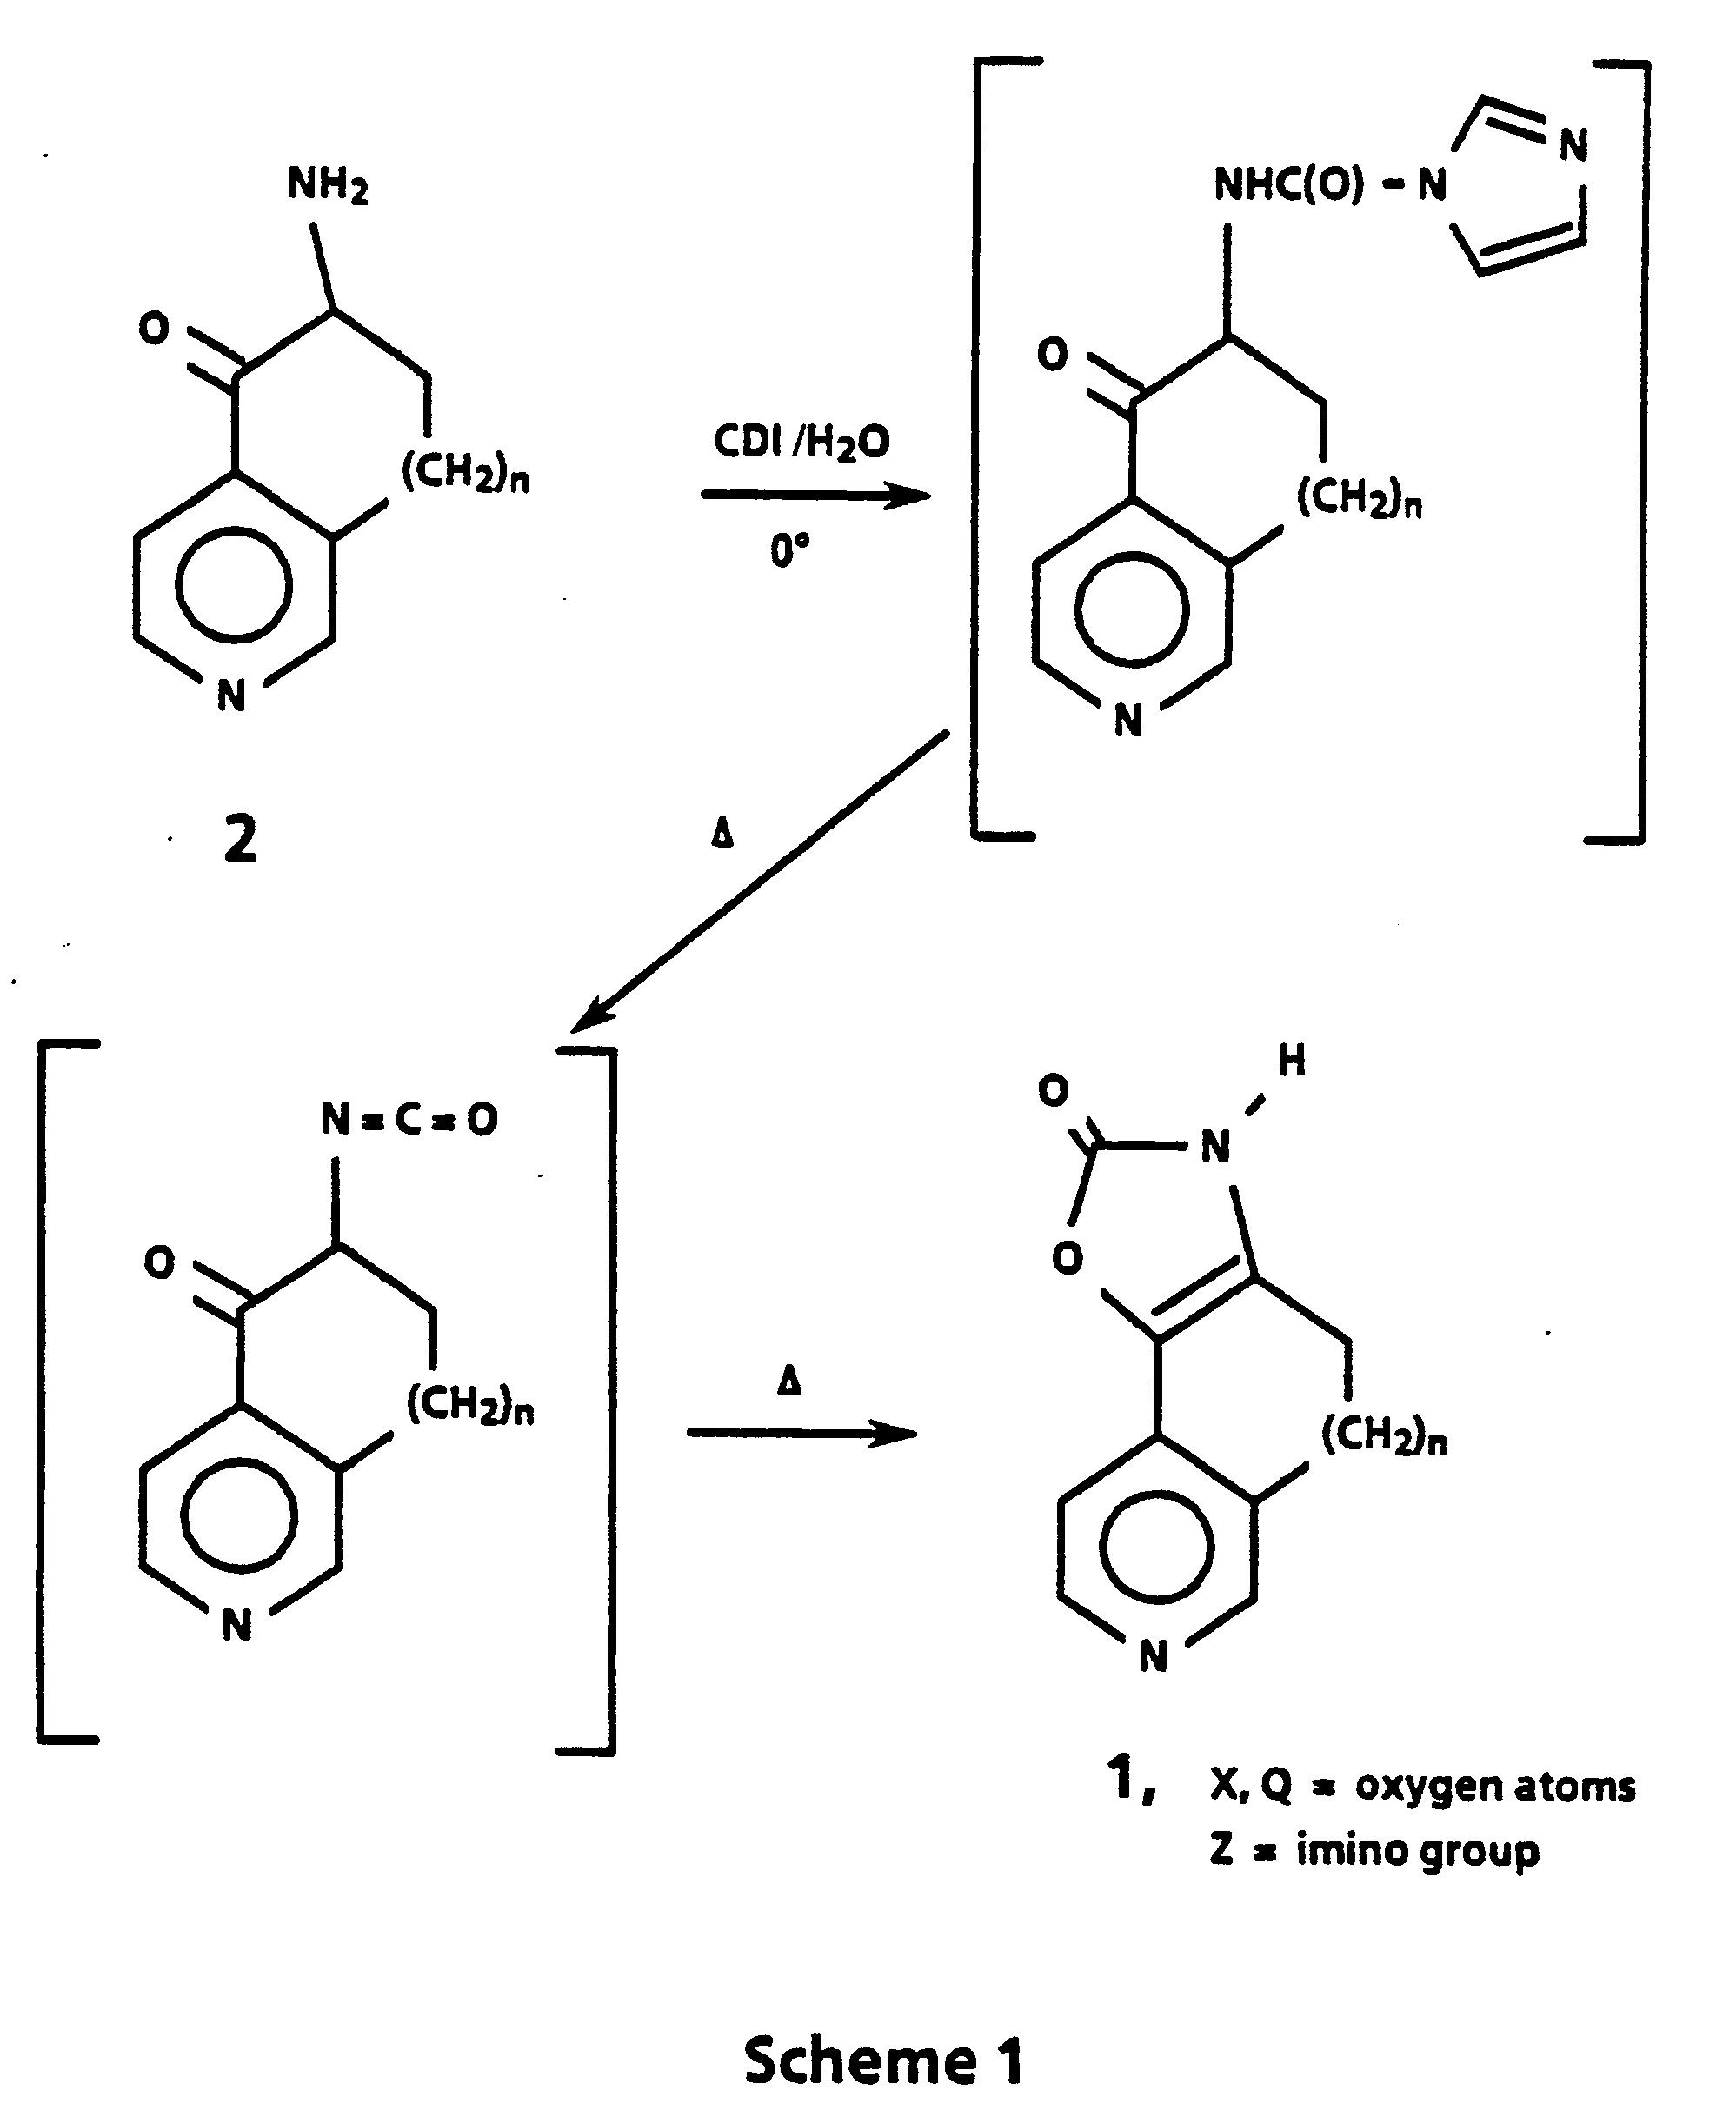 Ep0293777a1 Cardiotonic Tricyclic Oxazolones Google Patents Oxygen Atom Model Atomic Diagram Figure Imgb0002